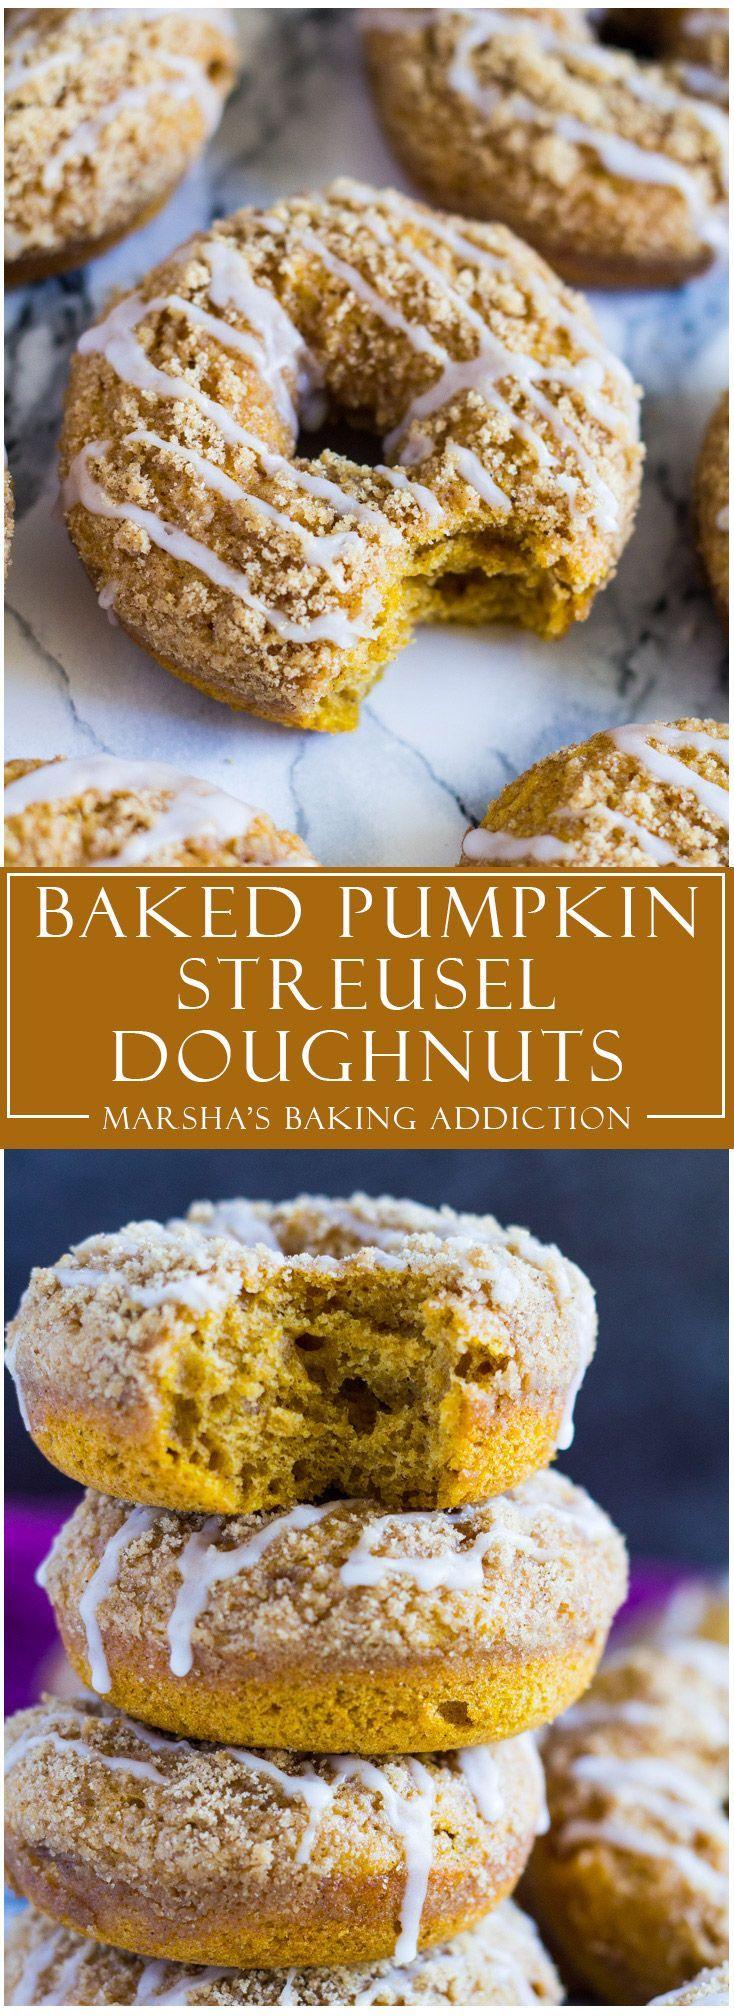 Baked Pumpkin Streusel Doughnuts   http://marshasbakingaddiction.com /marshasbakeblog/